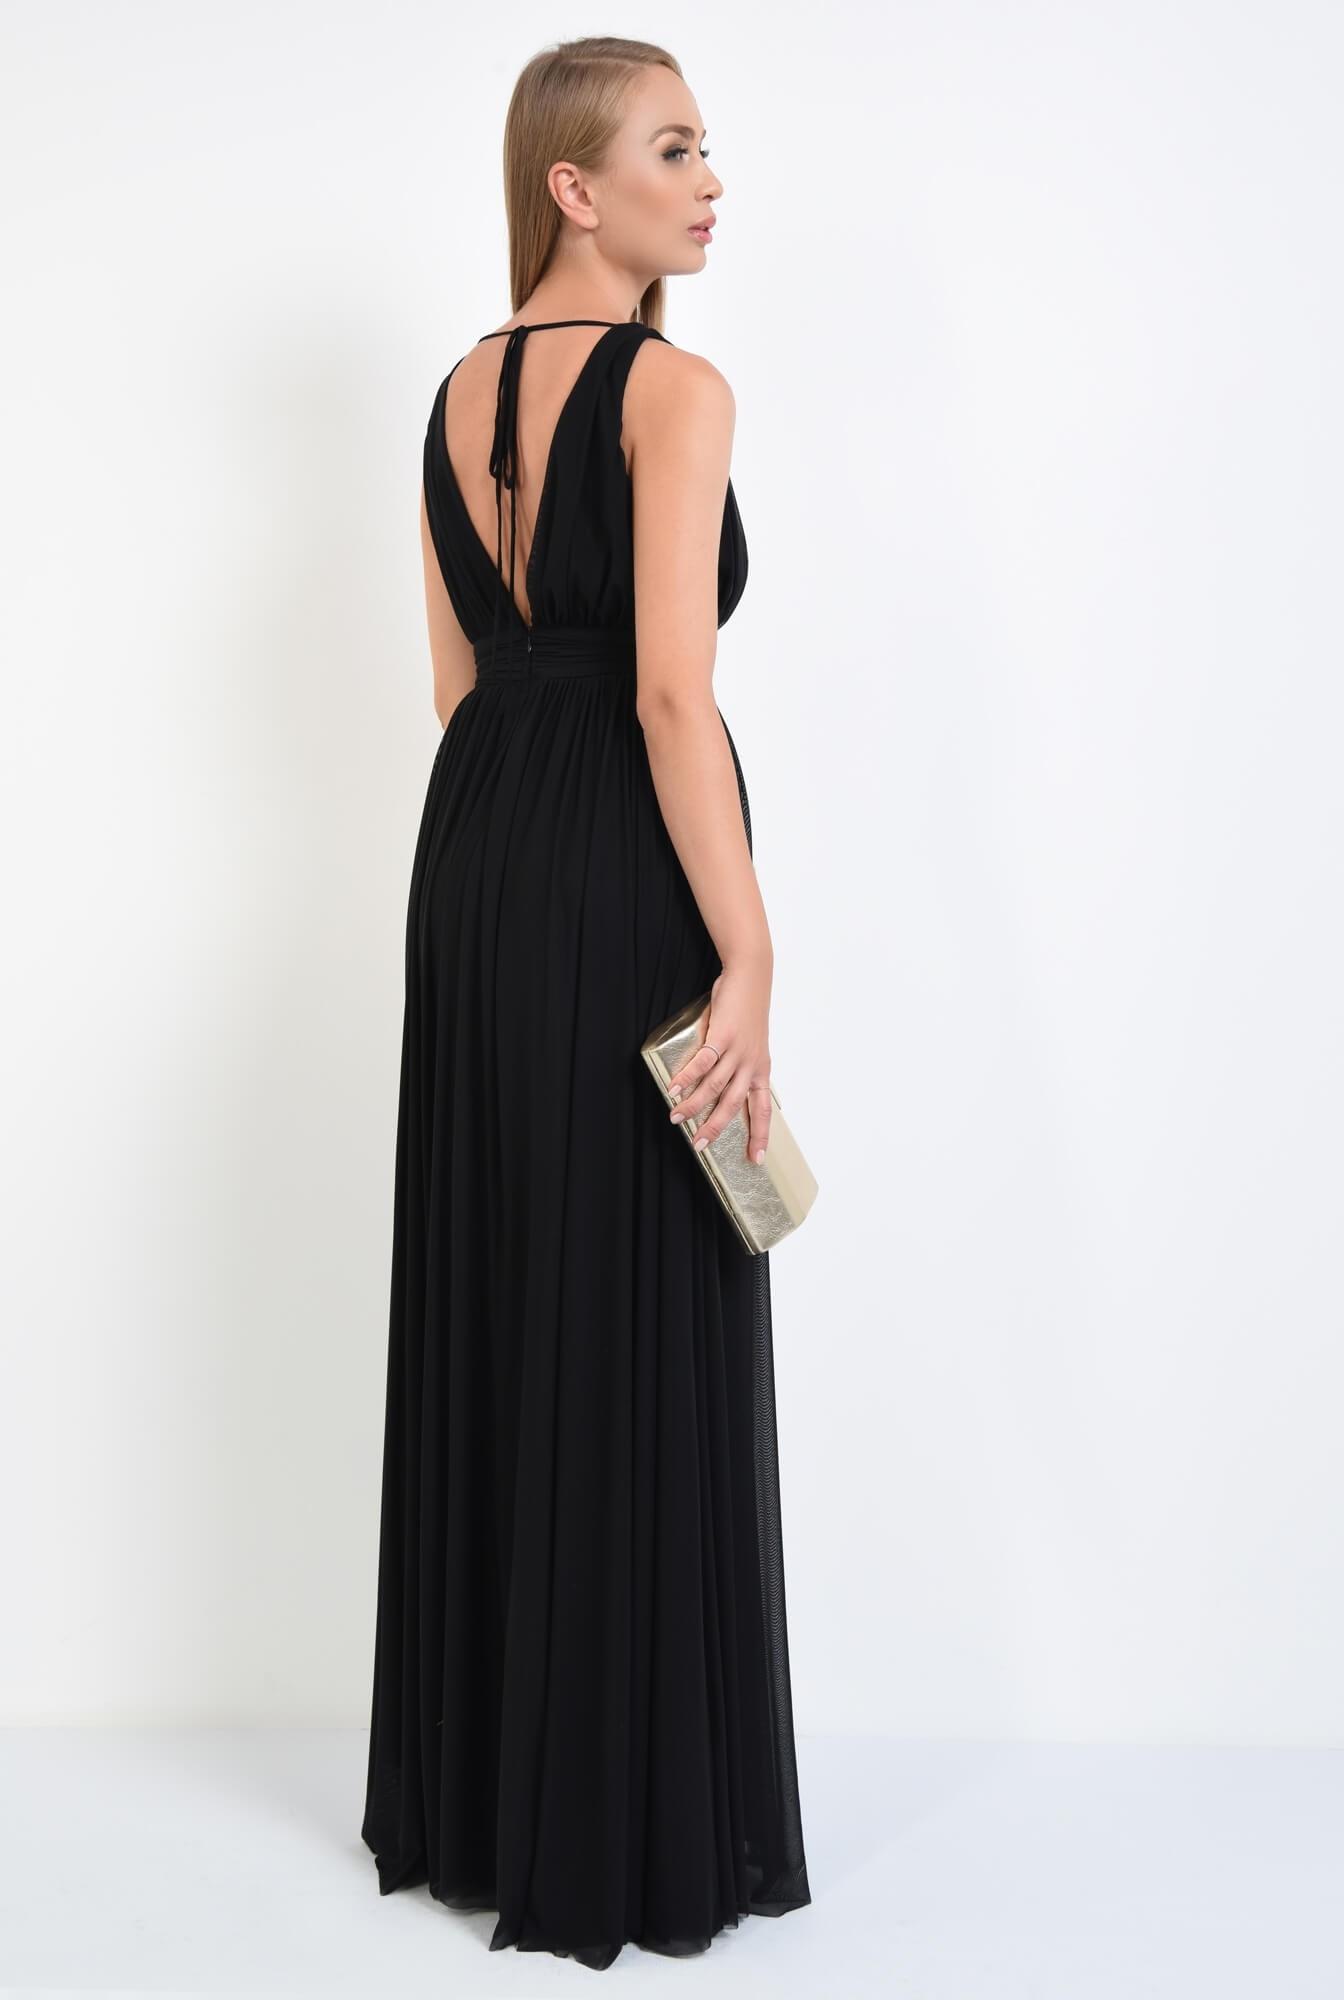 1 - rochie eleganta, lunga, tul, negru, decolteu, anchior